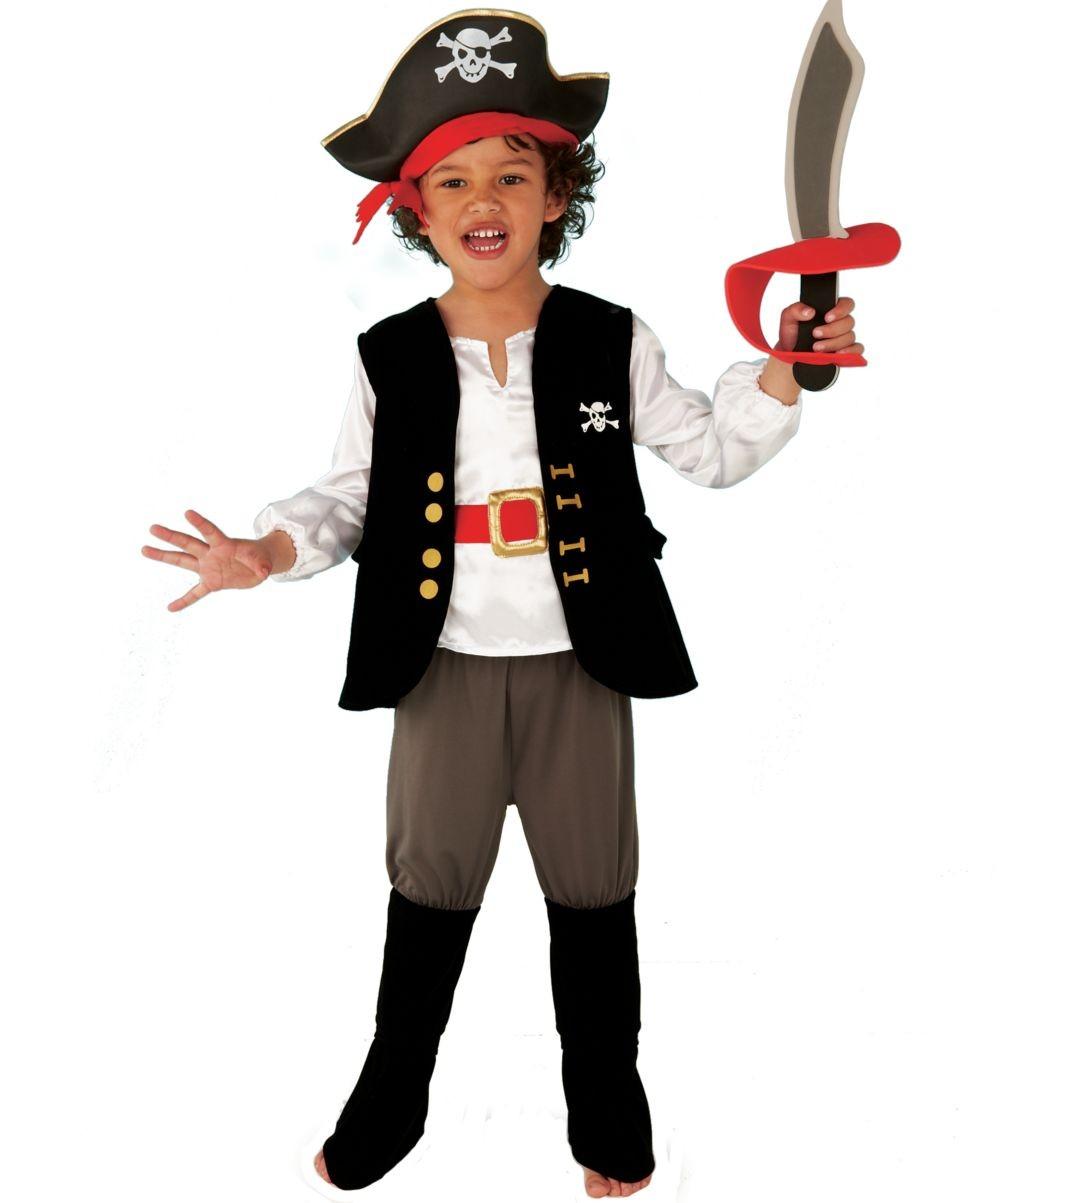 Костюм пирата на новый год своими руками